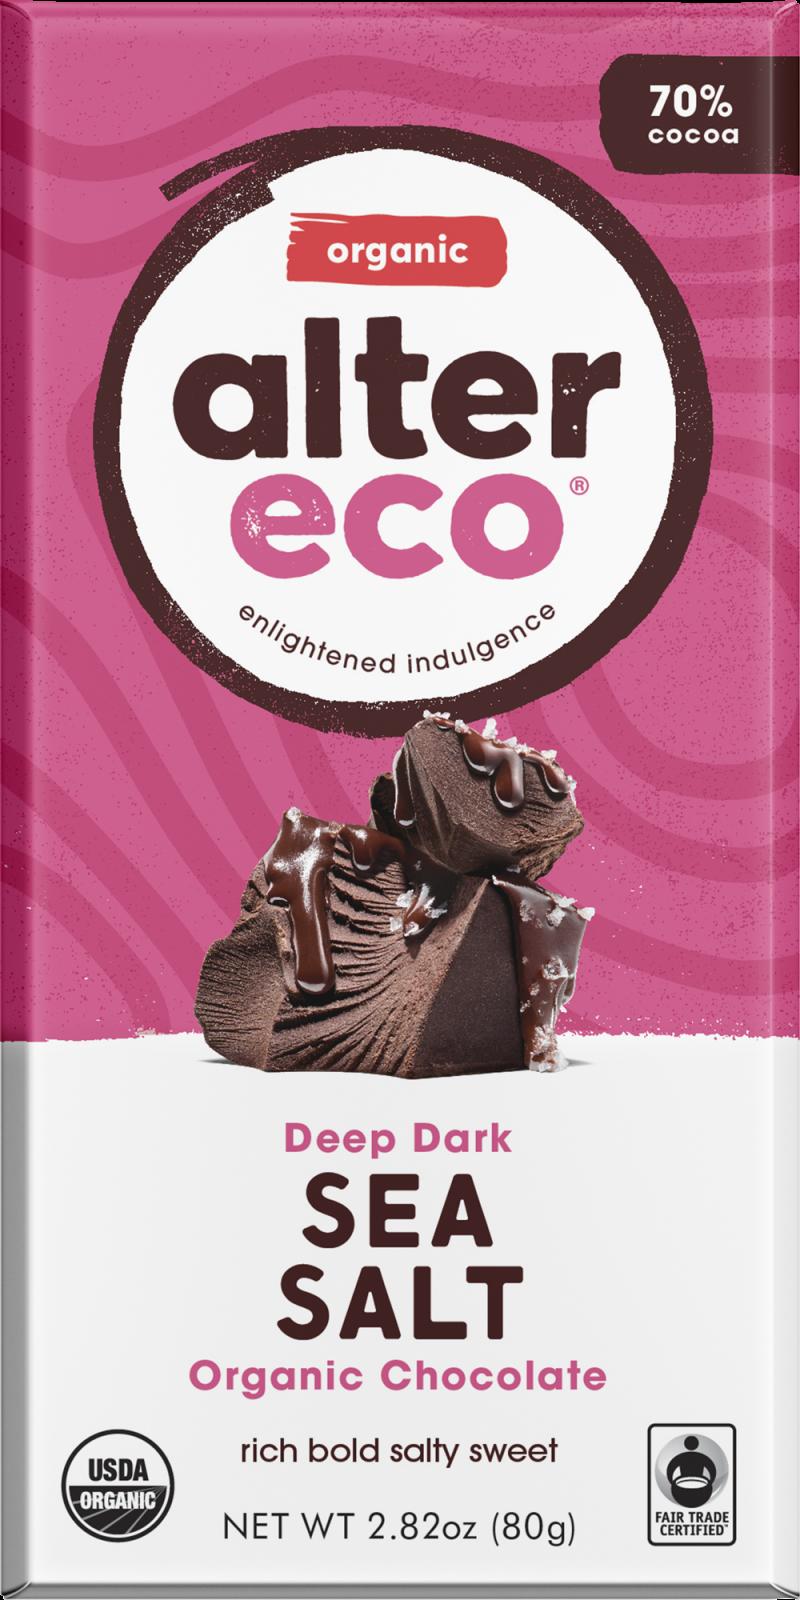 Deep Dark Organic Chocolate